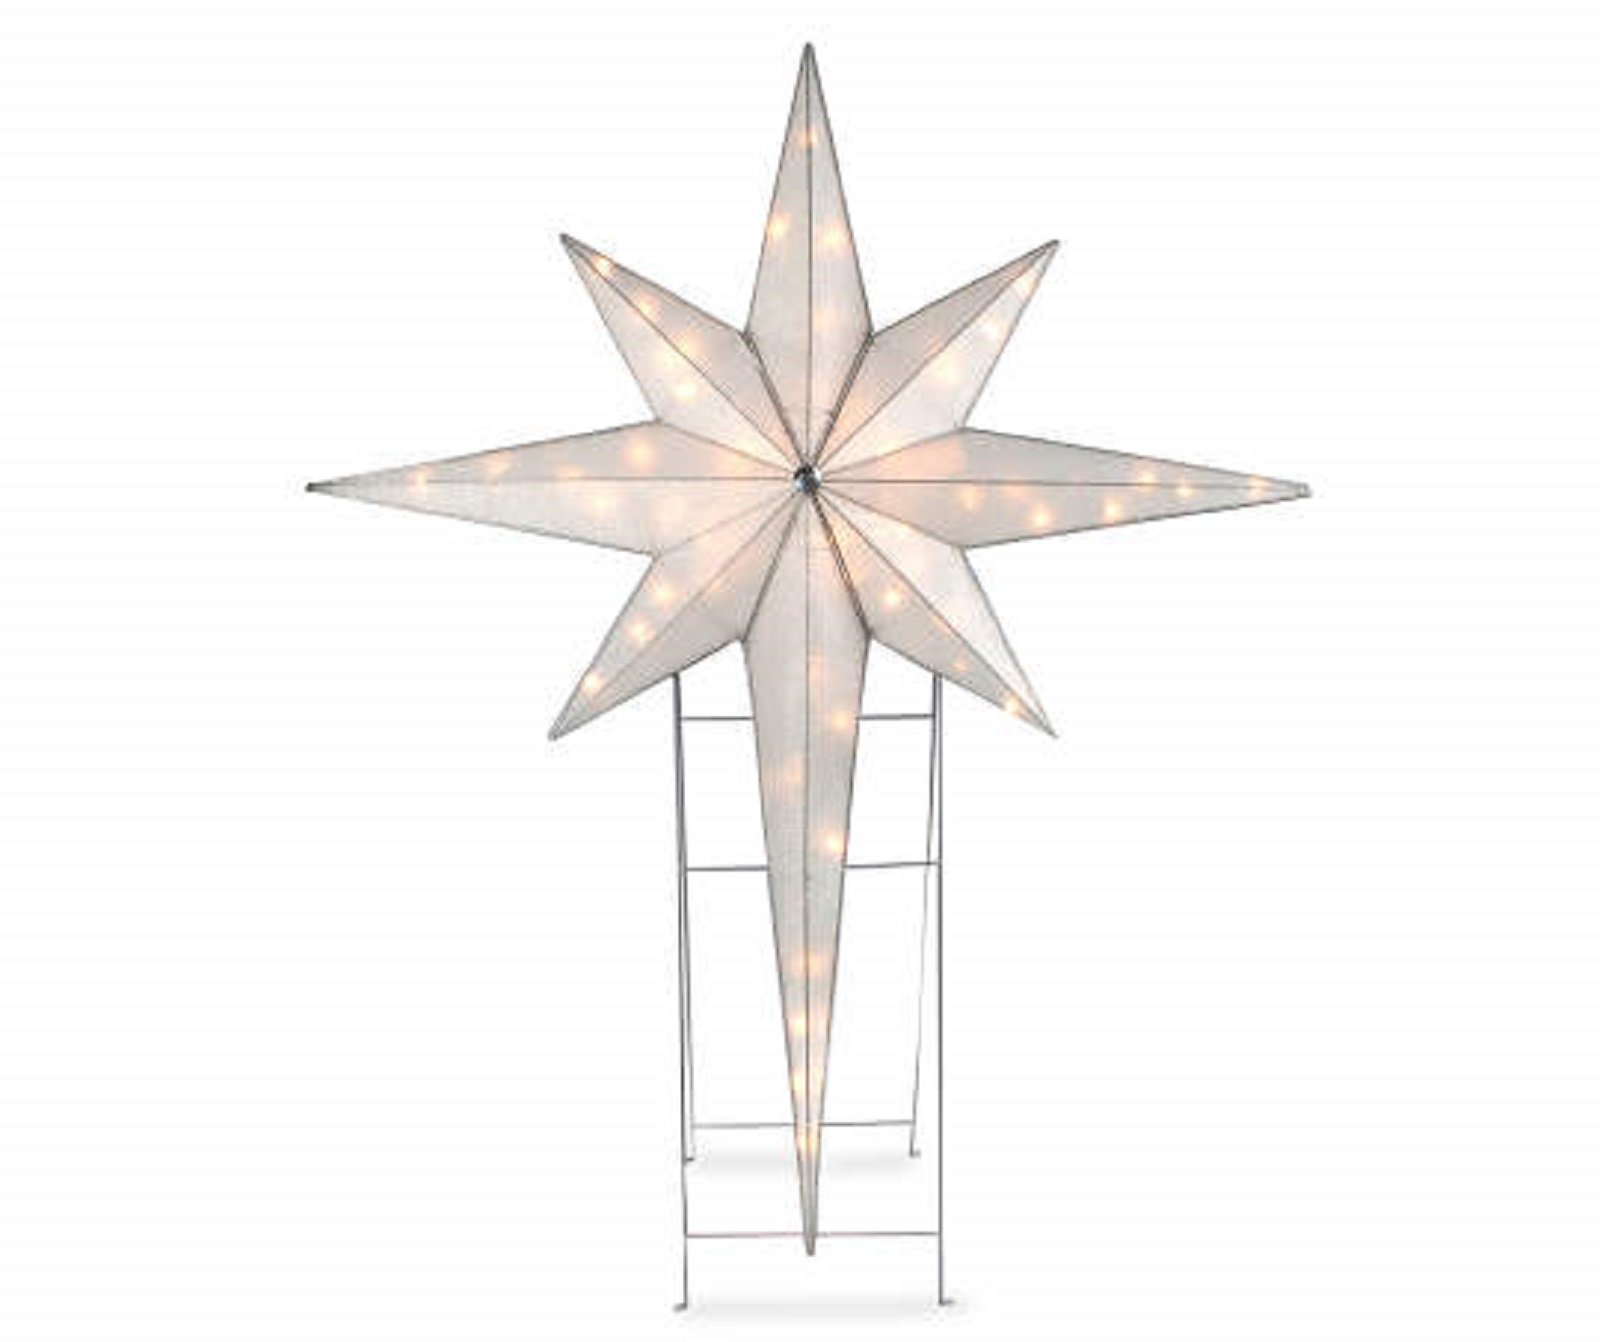 Large 4.6 Pre Lit Star of Bethlehem Indoor Outdoor Holiday Yard Art Nativity